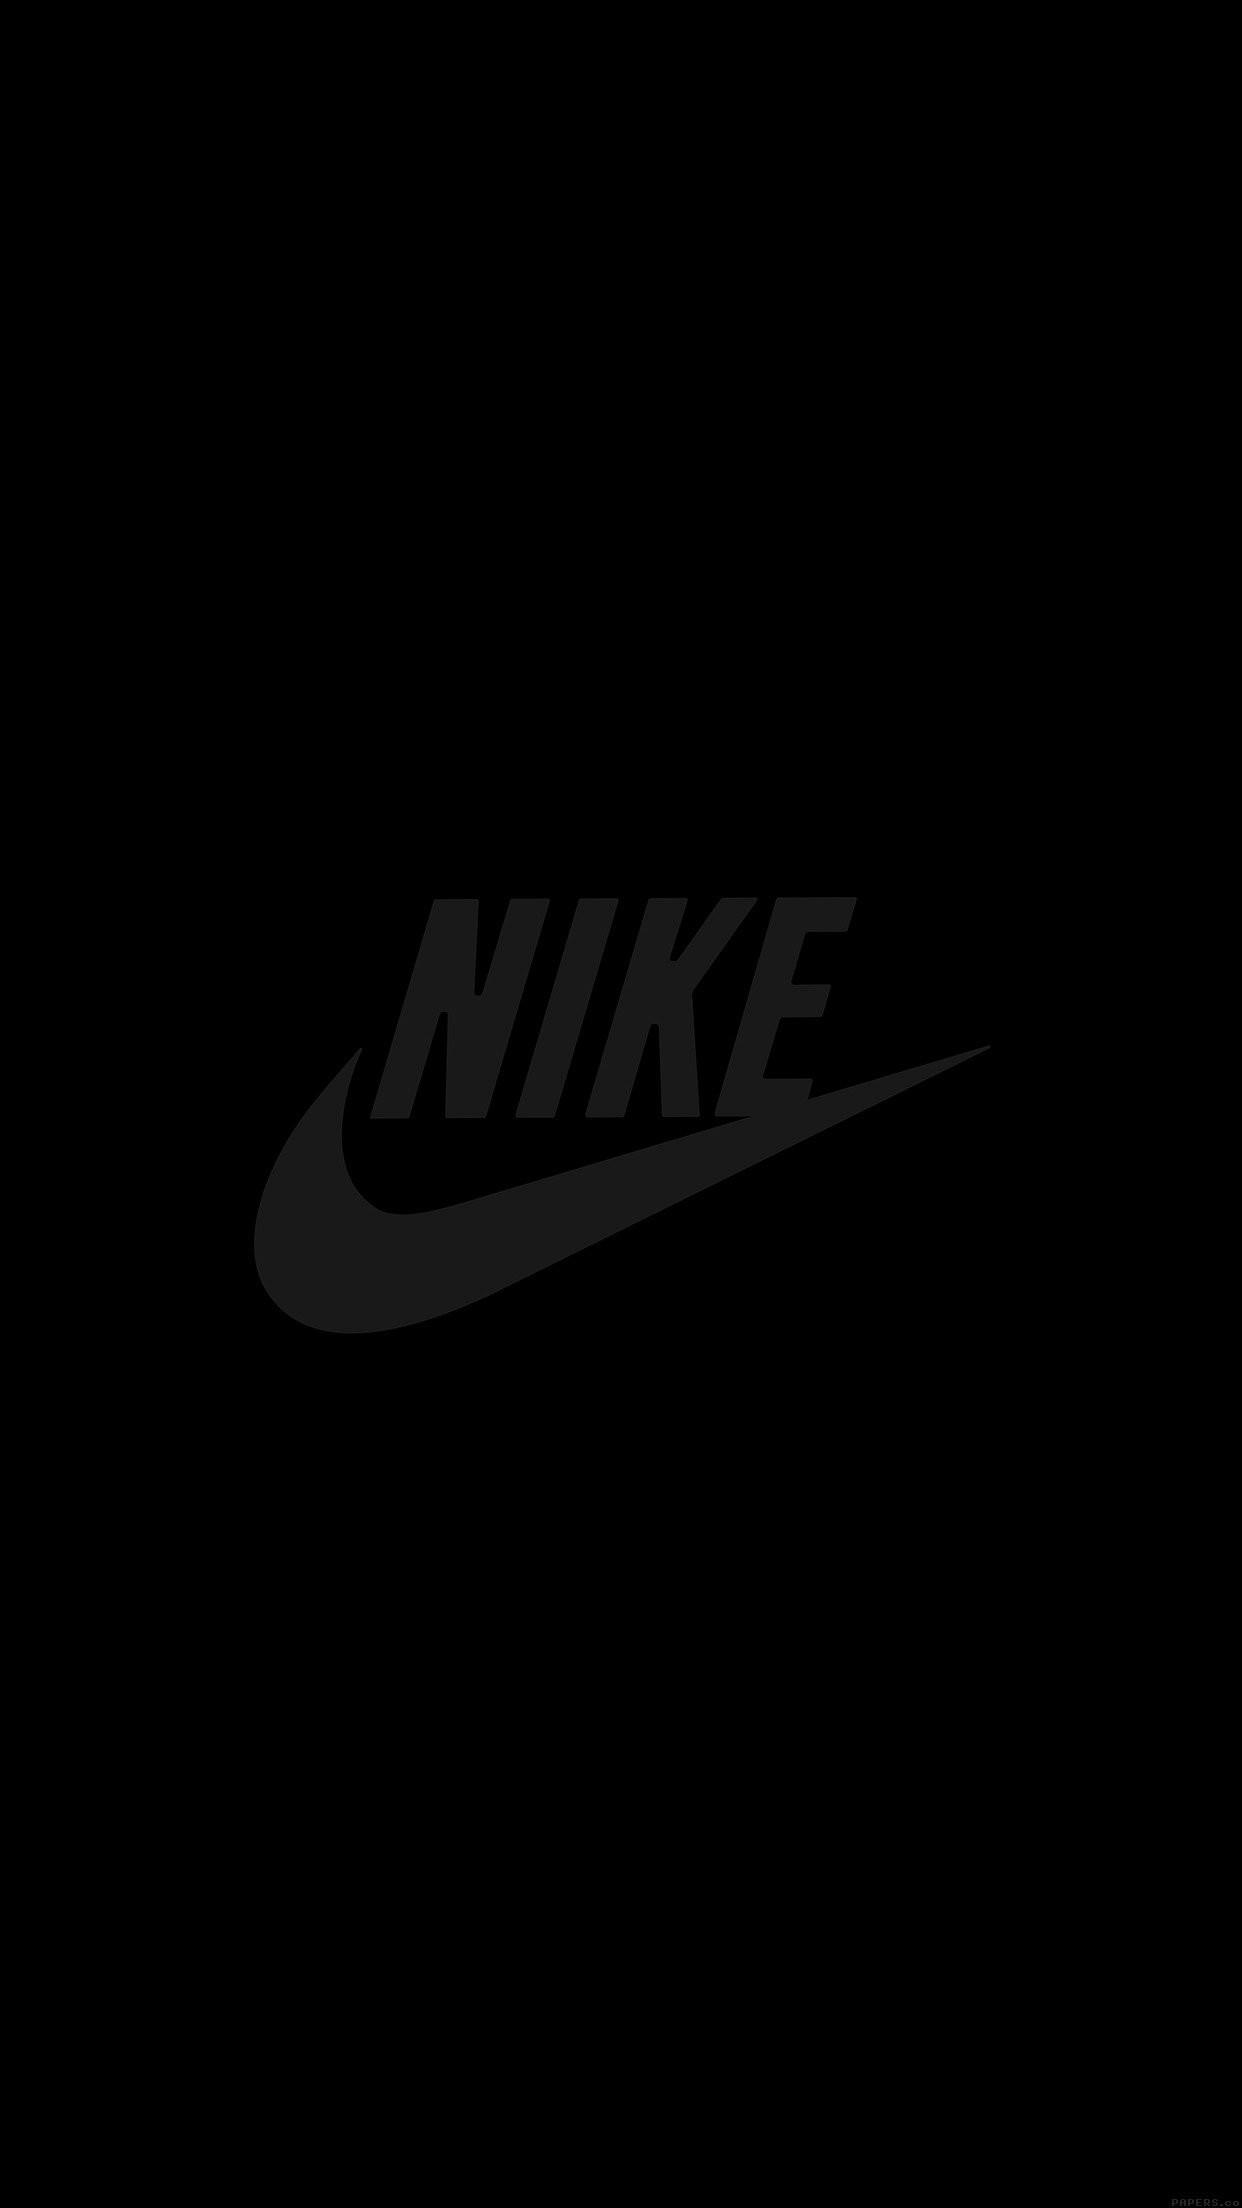 Res: 1242x2208, Inspirational Nike Black Wallpaper Hd Iphone Download Wallpaper Hd